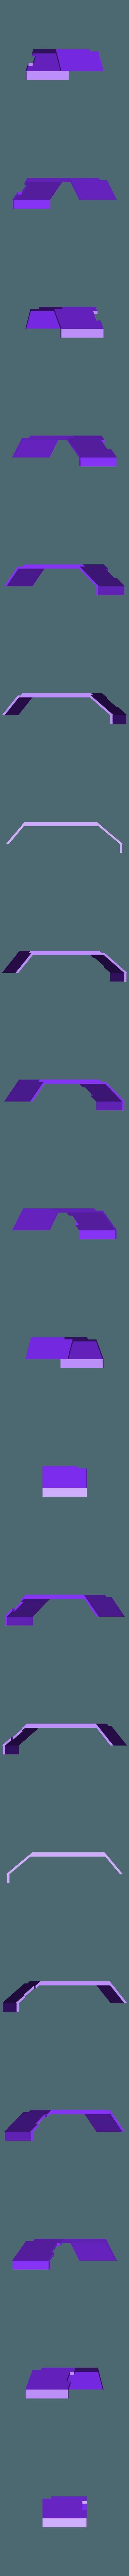 TruckV3_Props_fender_rear_left.STL Download STL file 3D Printed RC Truck V3 • 3D print model, MrCrankyface